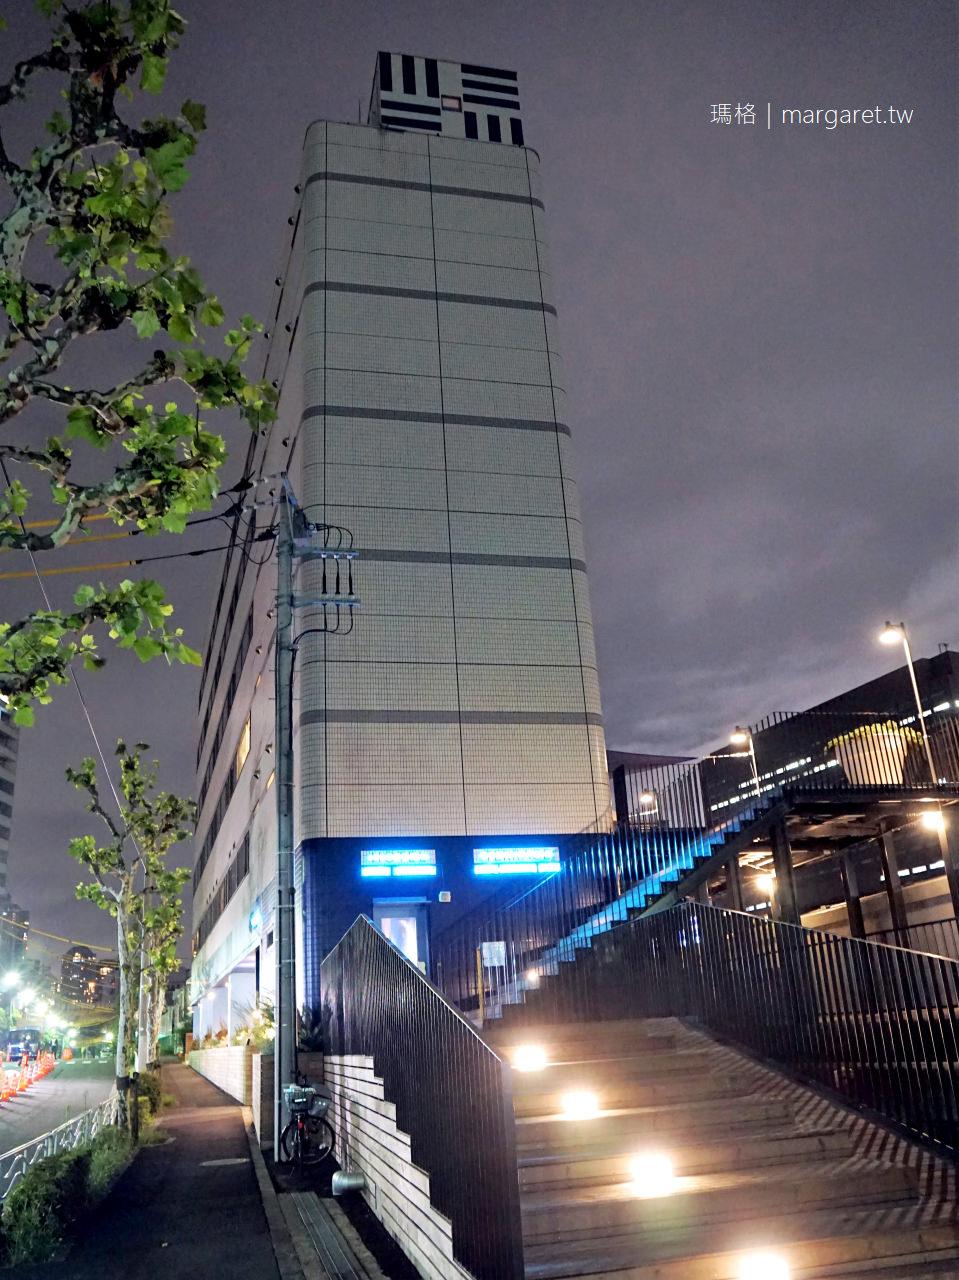 LYURO東京清澄The Share Hotels|隅田川河景設計旅店|藝術、共享露臺、晴空塔、清洲橋、手工精釀啤酒 @瑪格。圖寫生活